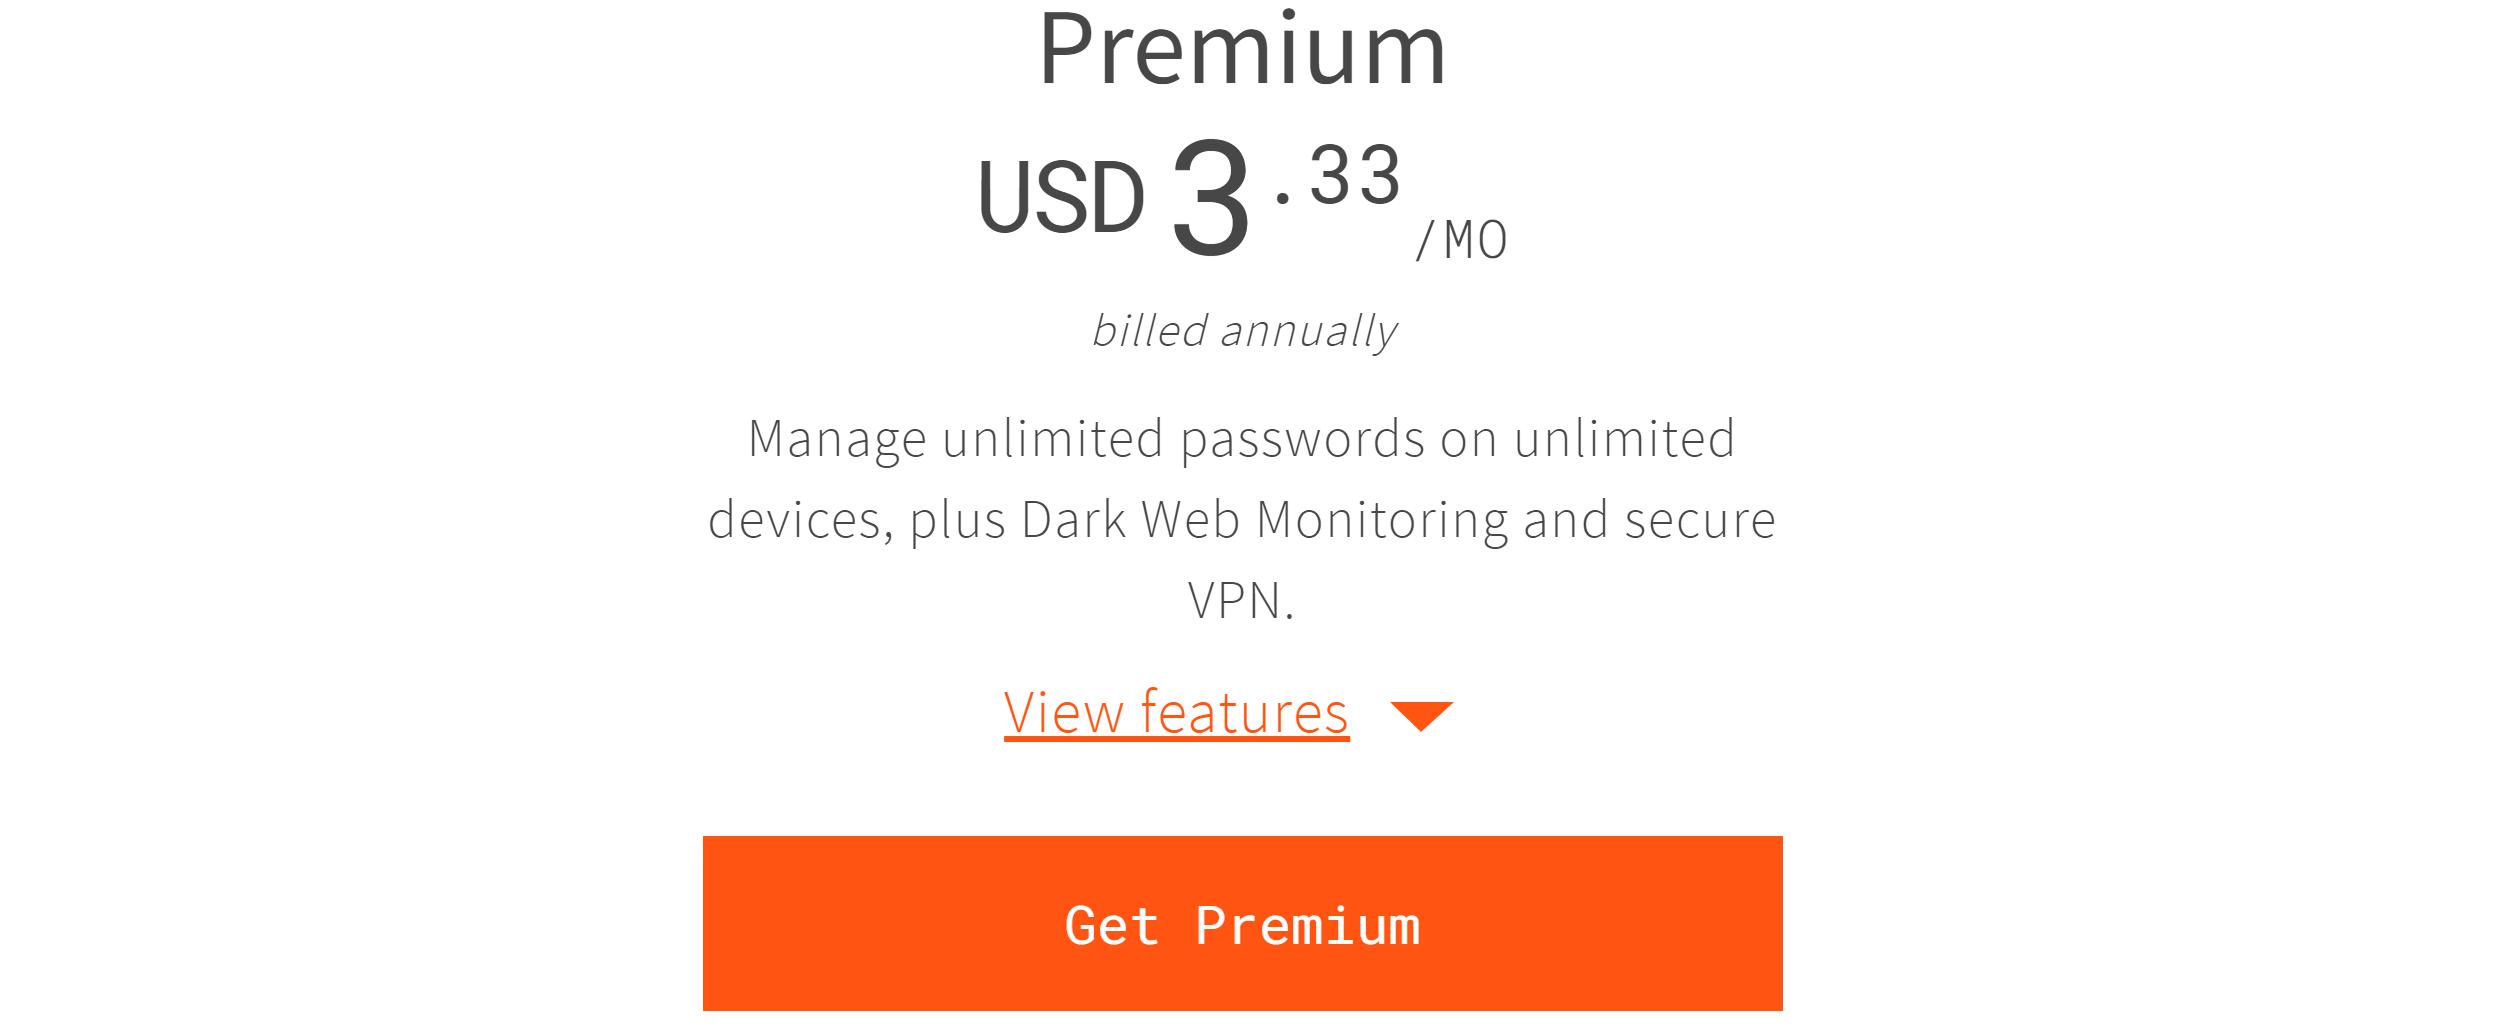 Dashlane Review 2019 Dashlane Password Manager App Cheapest Premium Plan